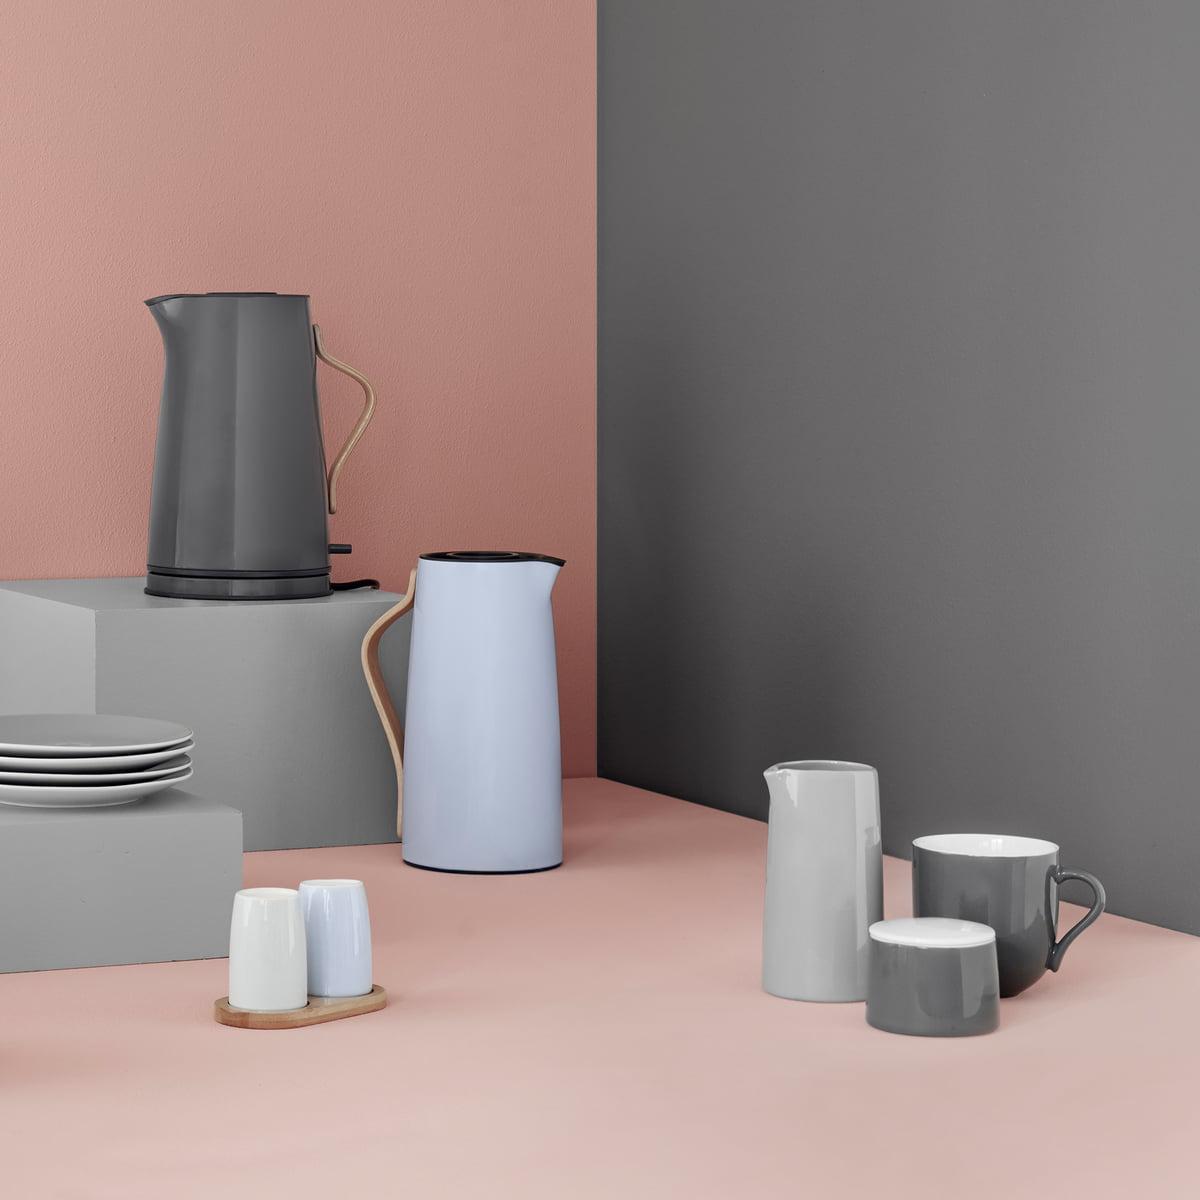 stelton emma wasserkocher connox shop. Black Bedroom Furniture Sets. Home Design Ideas